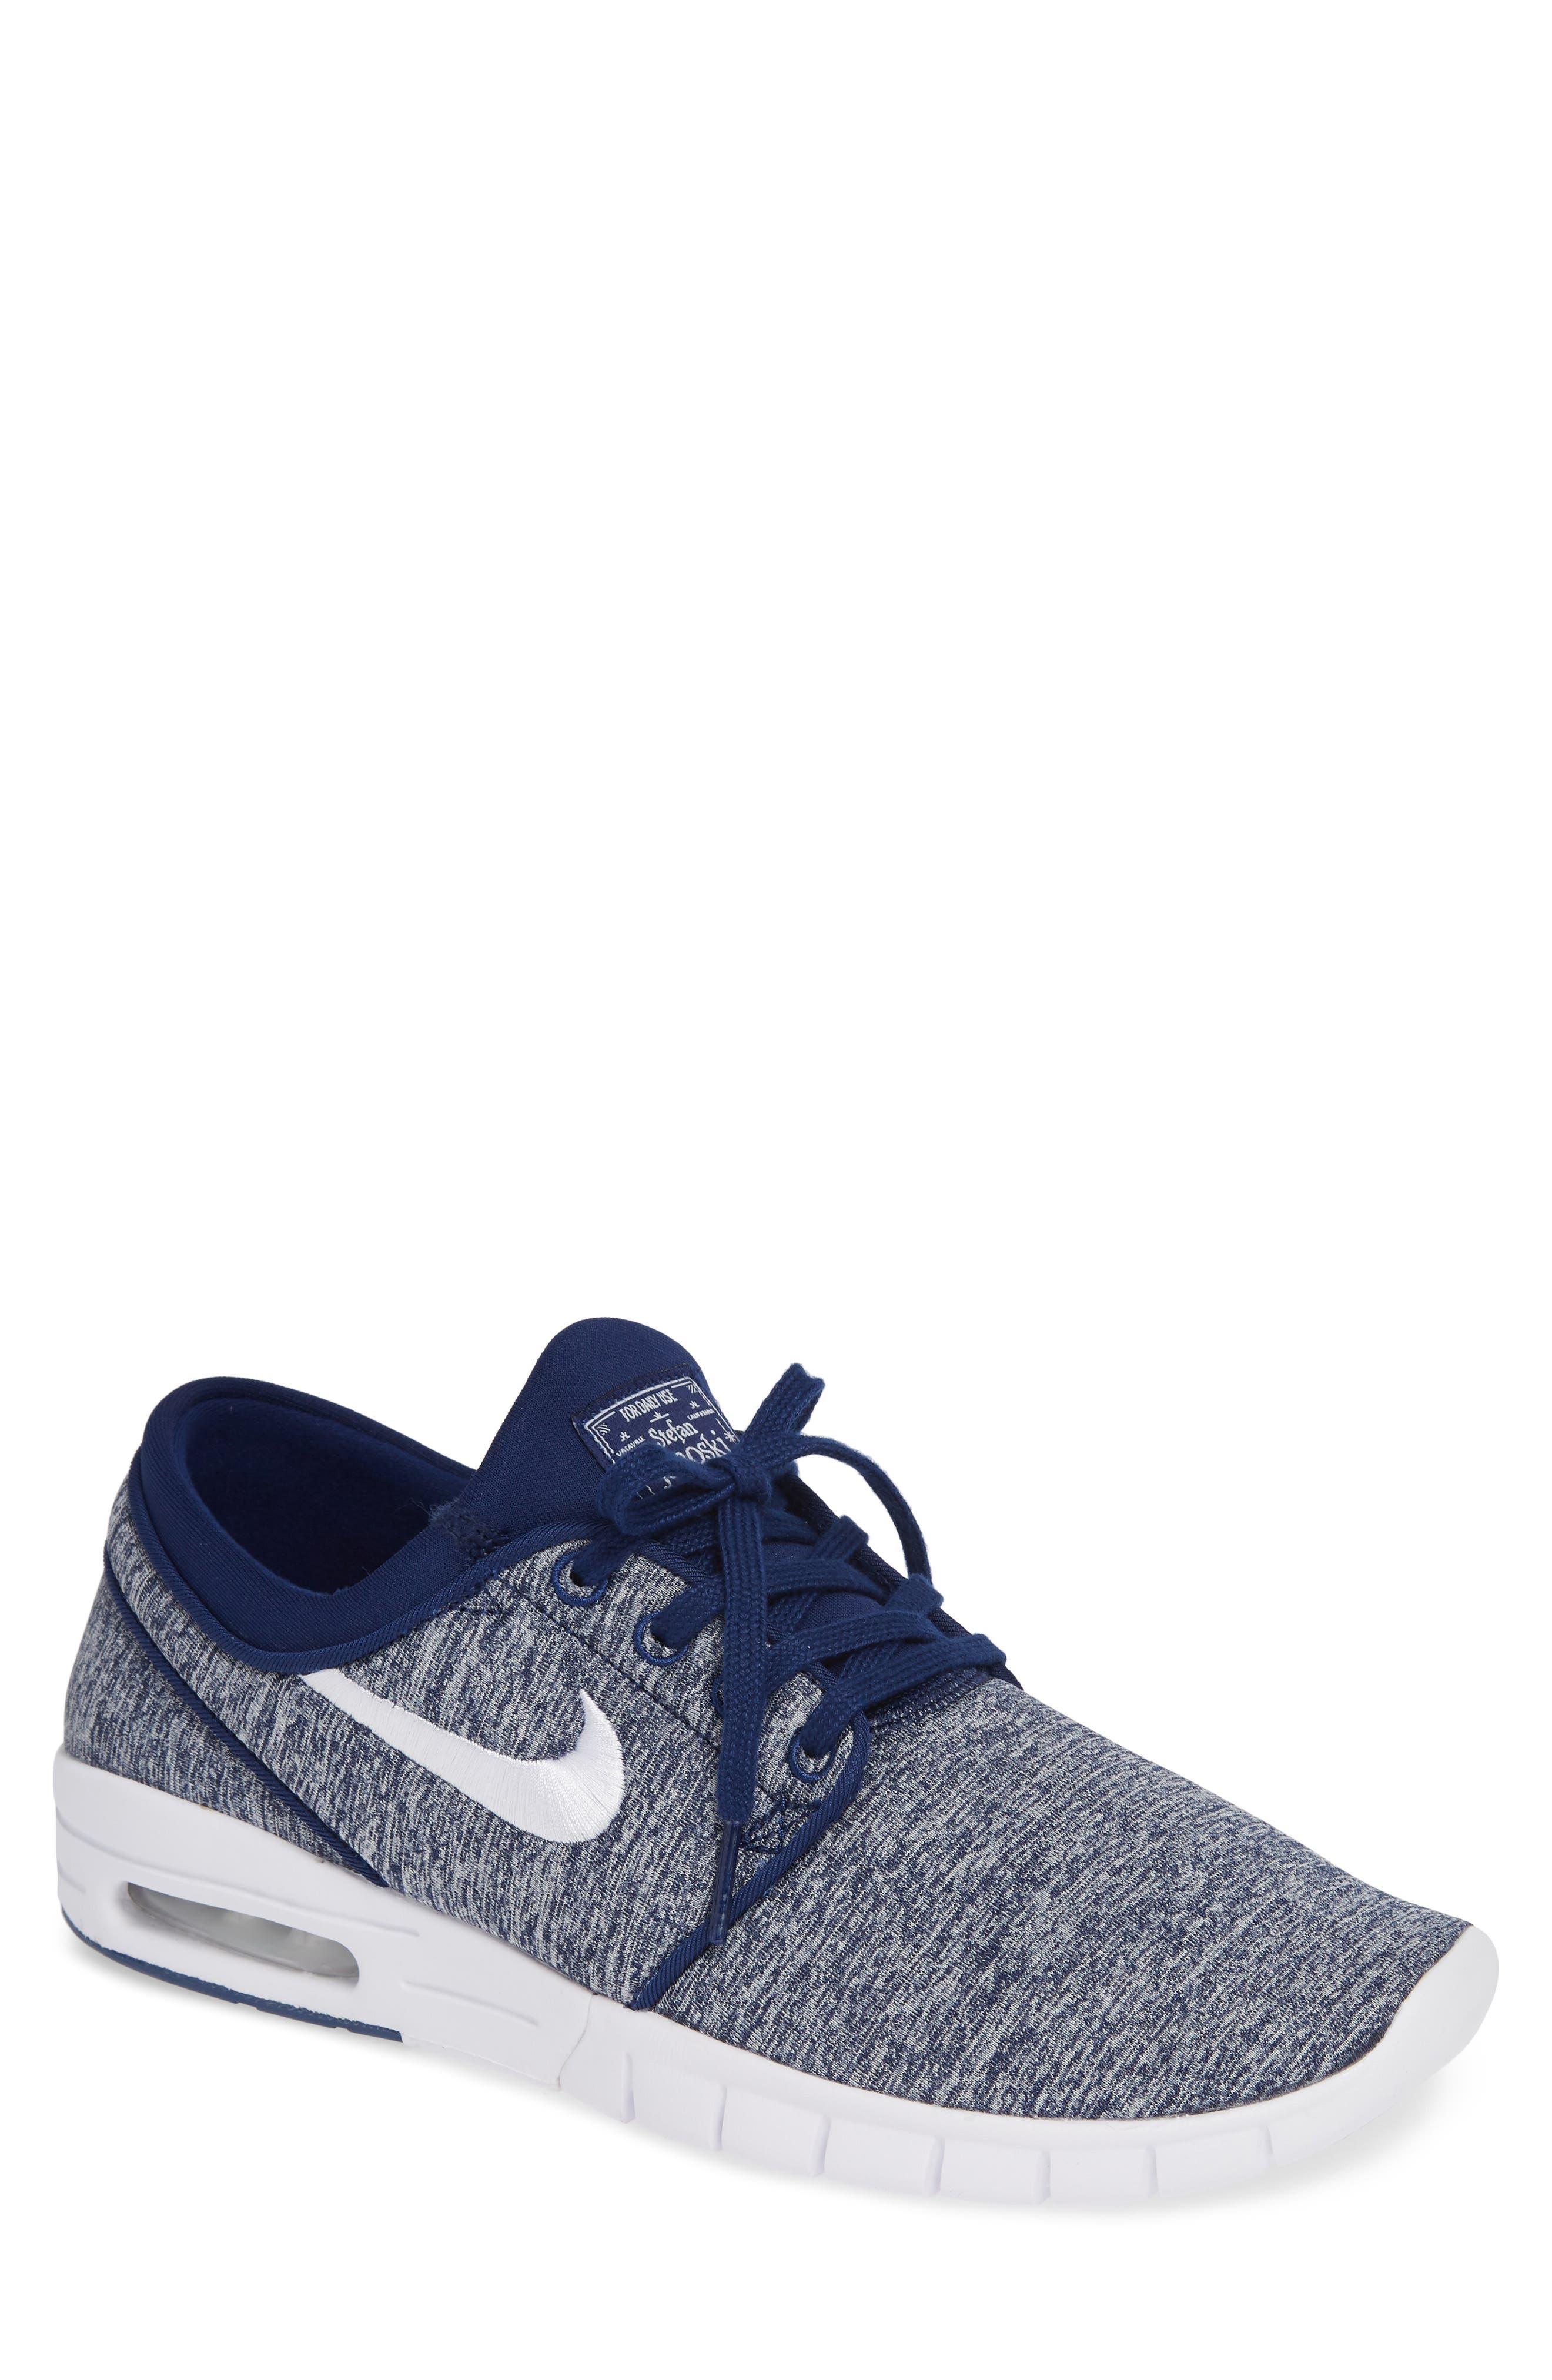 new product 43eae b123b Nike  Stefan Janoski - Max Sb  Skate Shoe In Blue Void  White